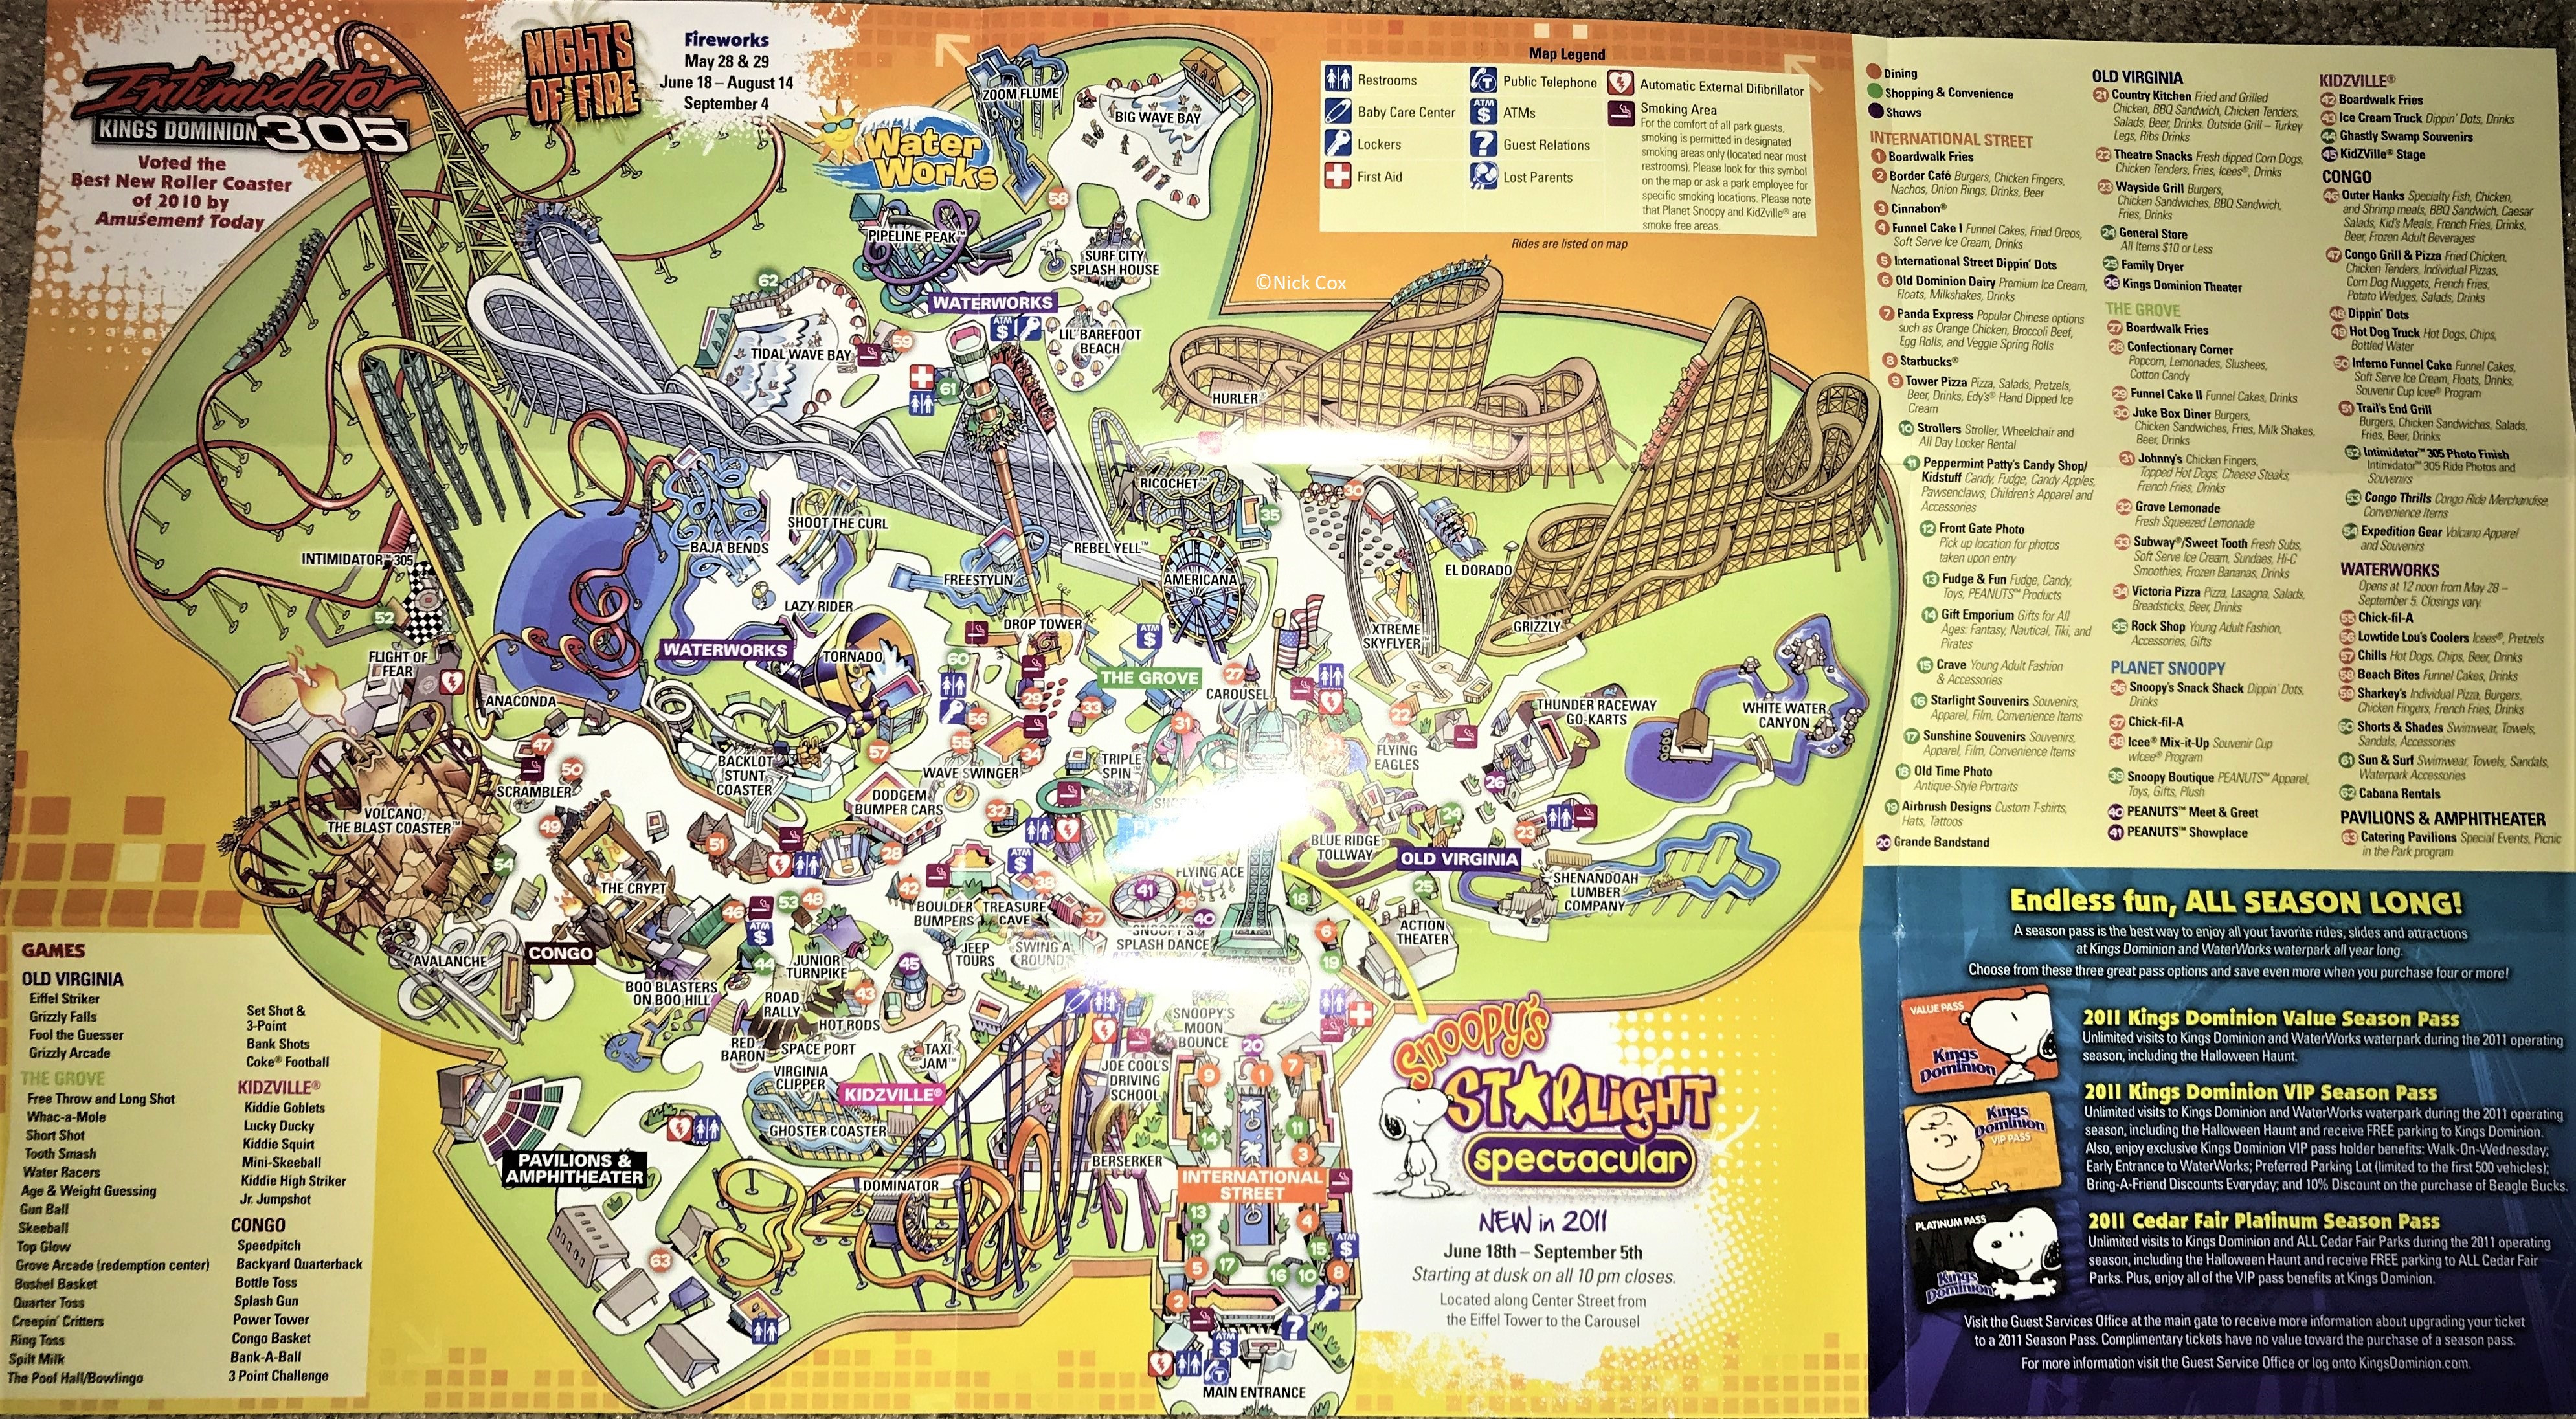 Amusement Parks California Map Best Of Kings Dominion Historical - Amusement Parks California Map